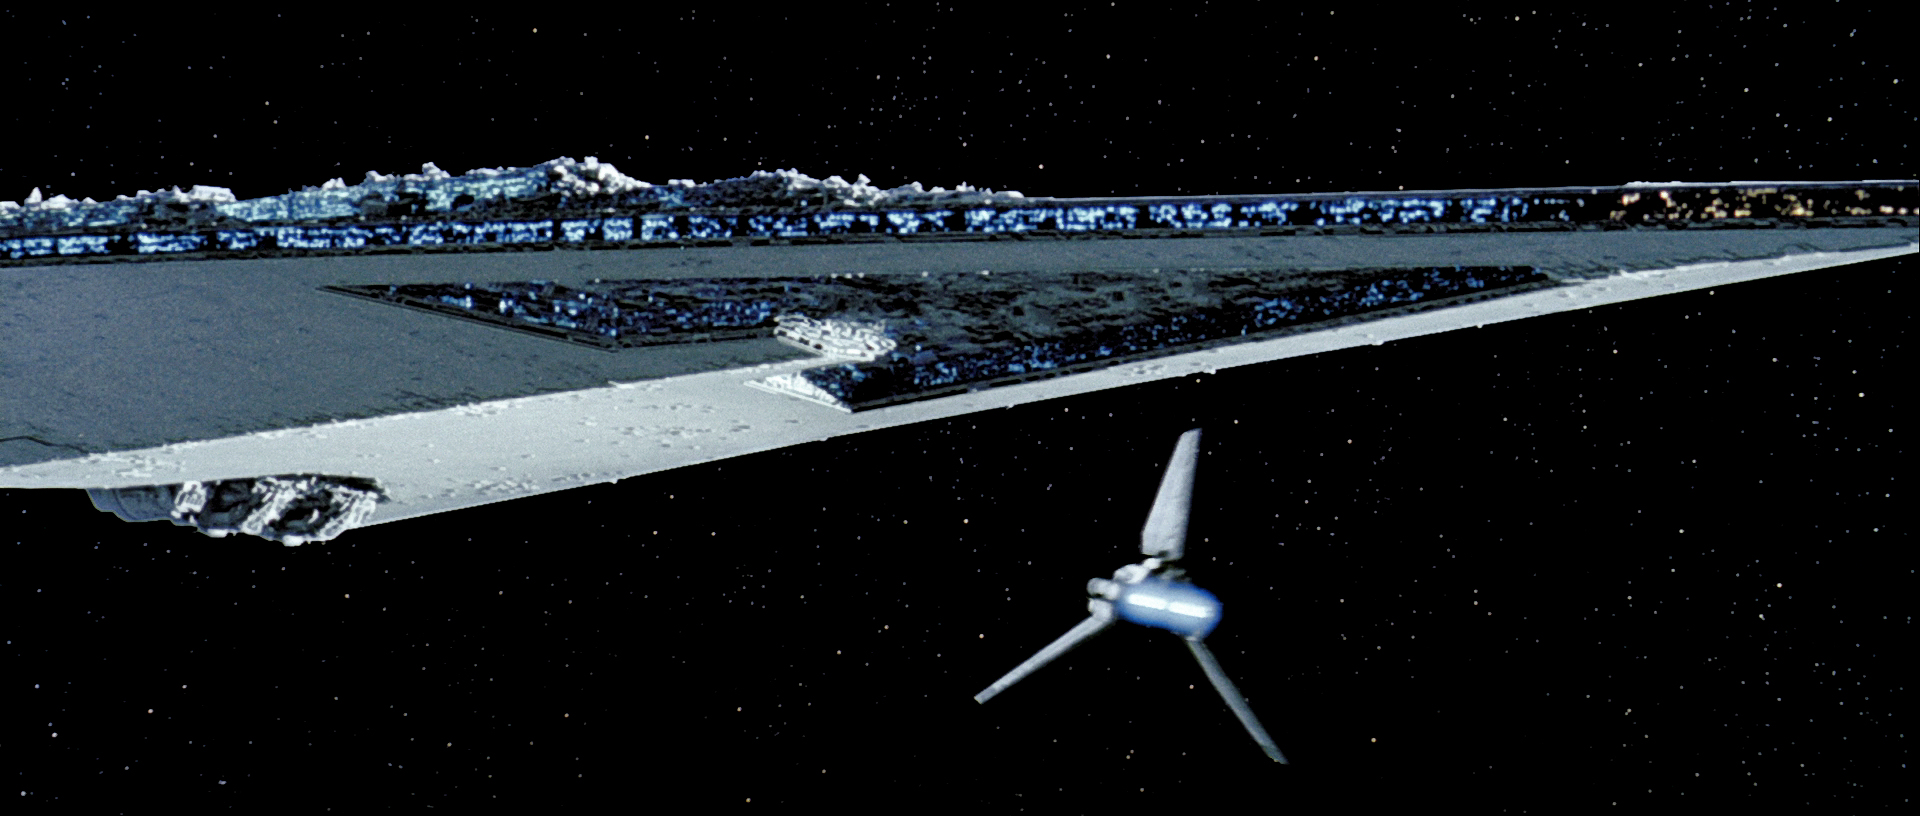 Kylo S Dreadnaught In Last Jedi Isn T As Big As Darth Vader S